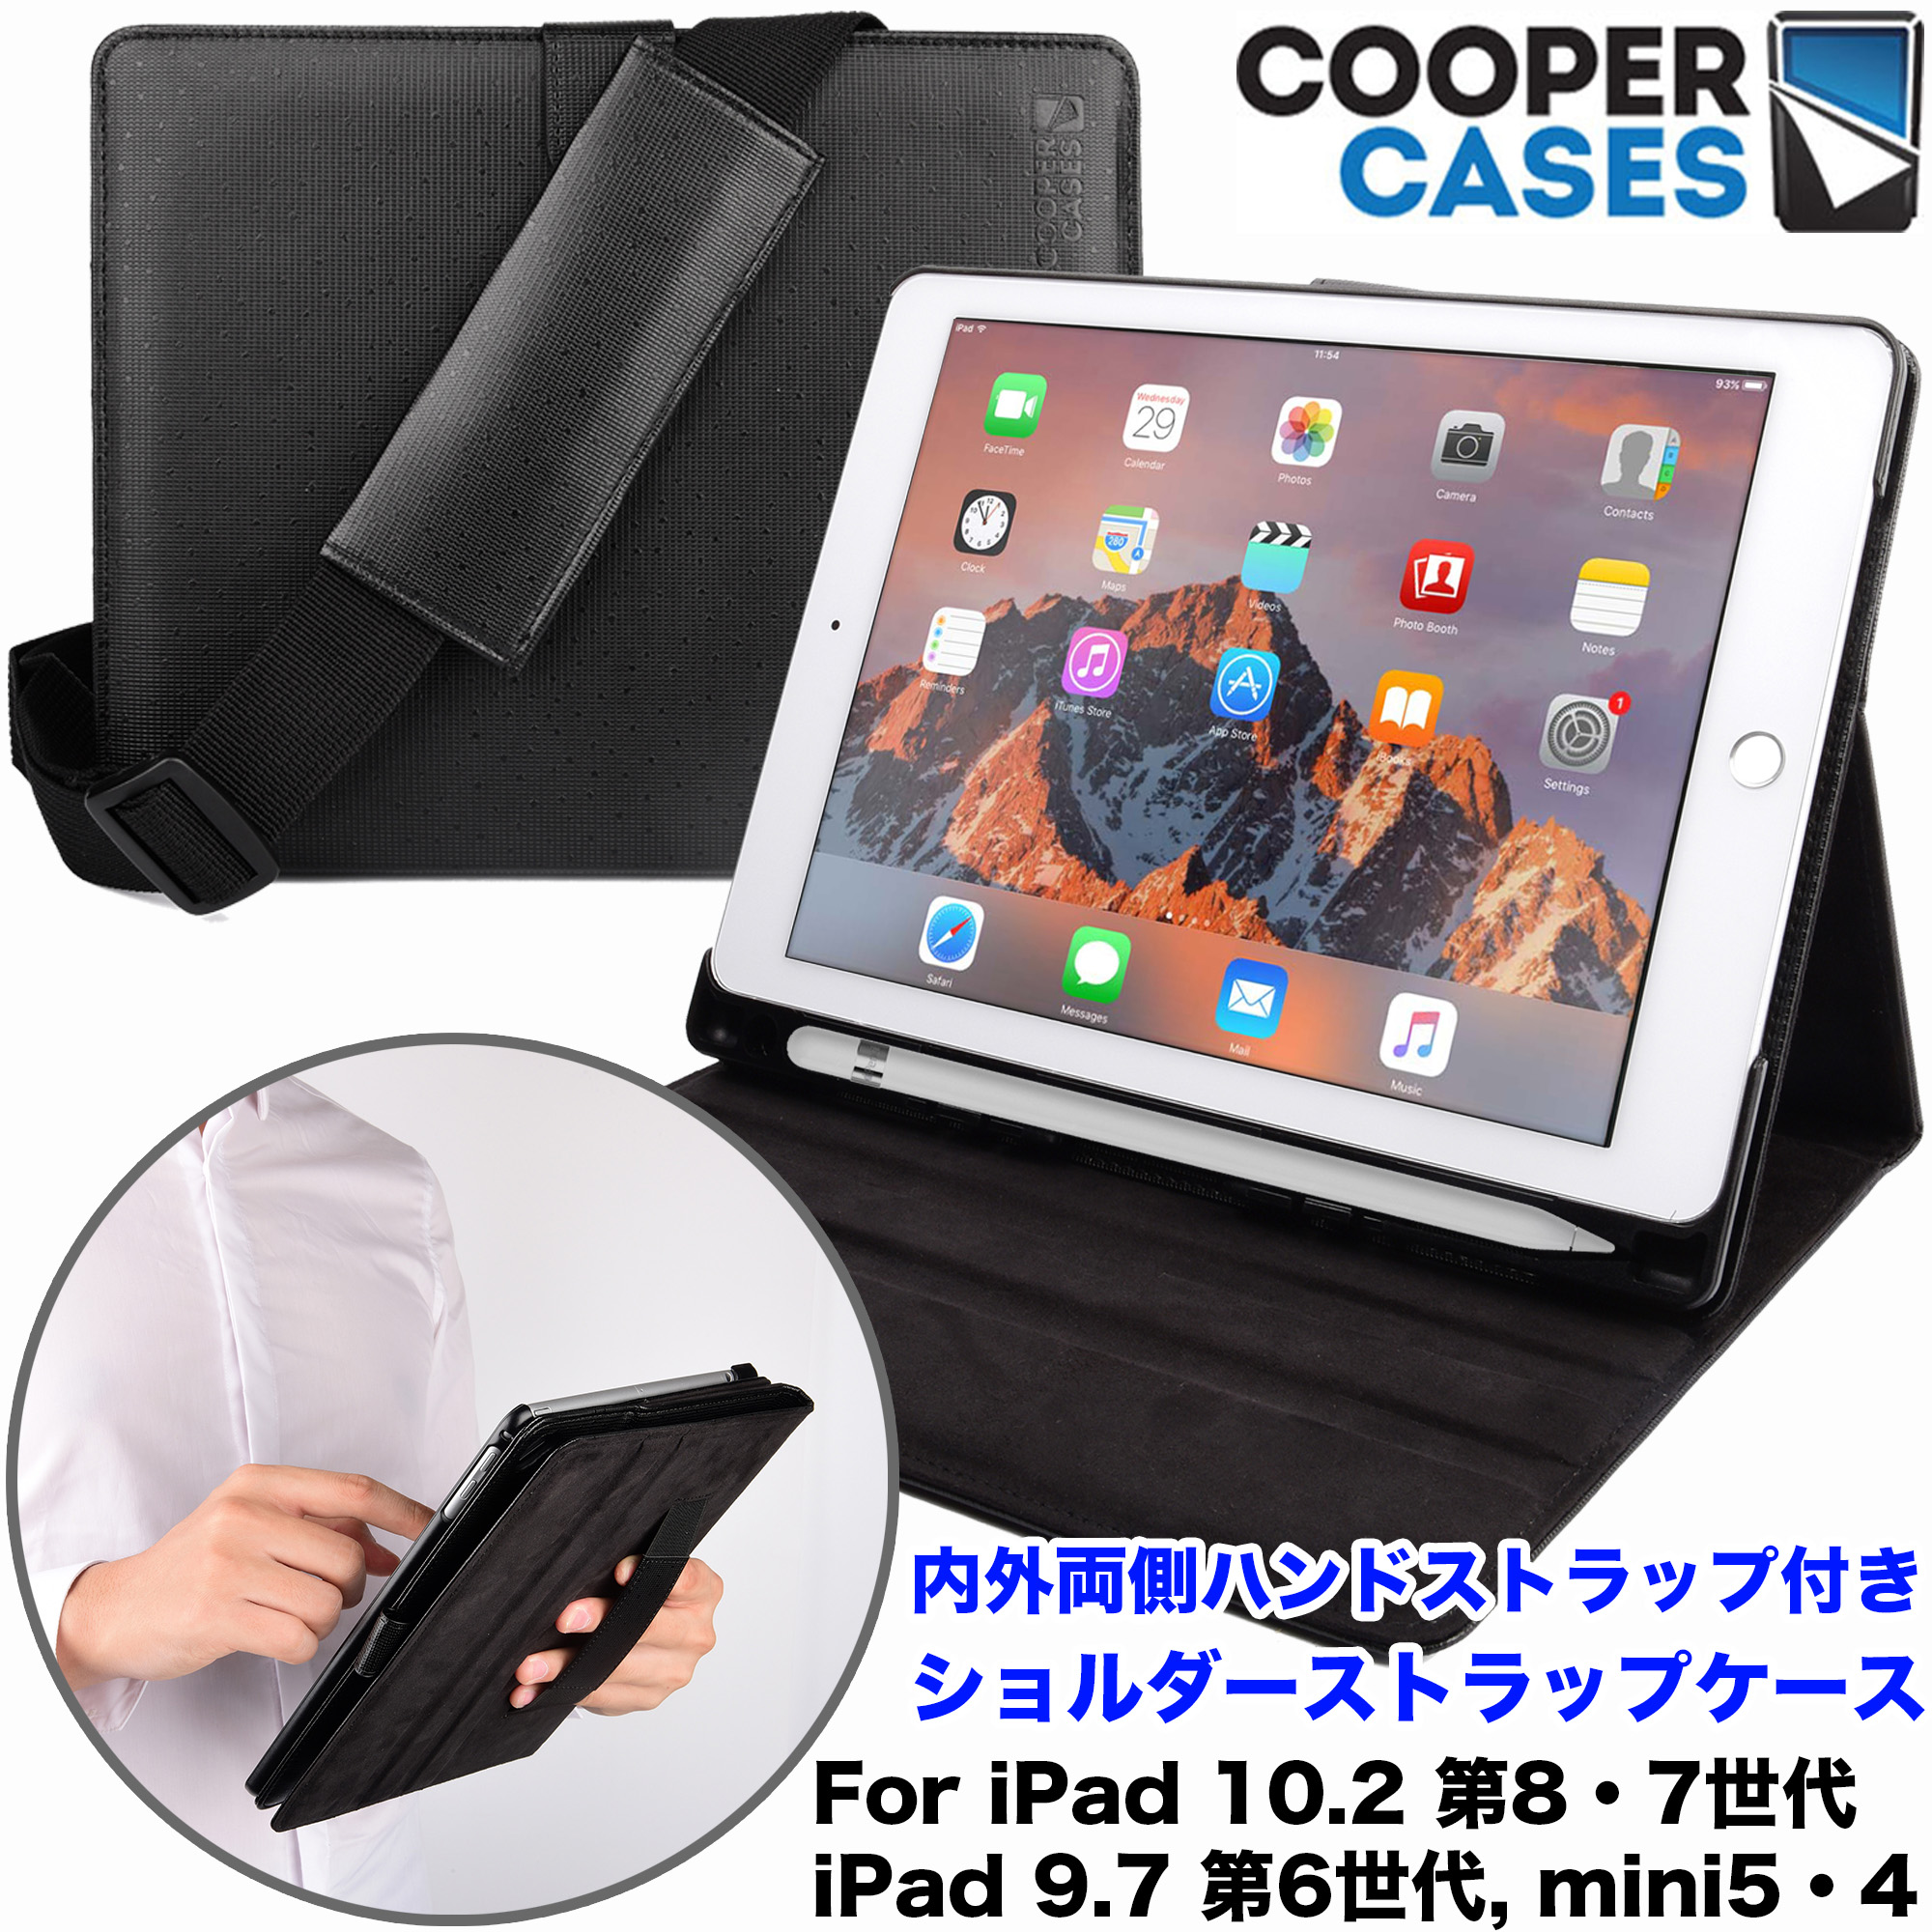 iPad 美品 10.2 Air3 9.7 2018 Air2 mini5 mini4 Cooper Cases Magic Carry Pro II ケース ショルダー ハンド ストラップ 第8世代 ミニ 後部座席 第7世代 車載 キャンプ おしゃれ mini air3 手帳型 持ち運び 新品未使用 丈夫 職場 第6世代 カバー ビジネス 第5世代 air2 アイパッド アウトドア